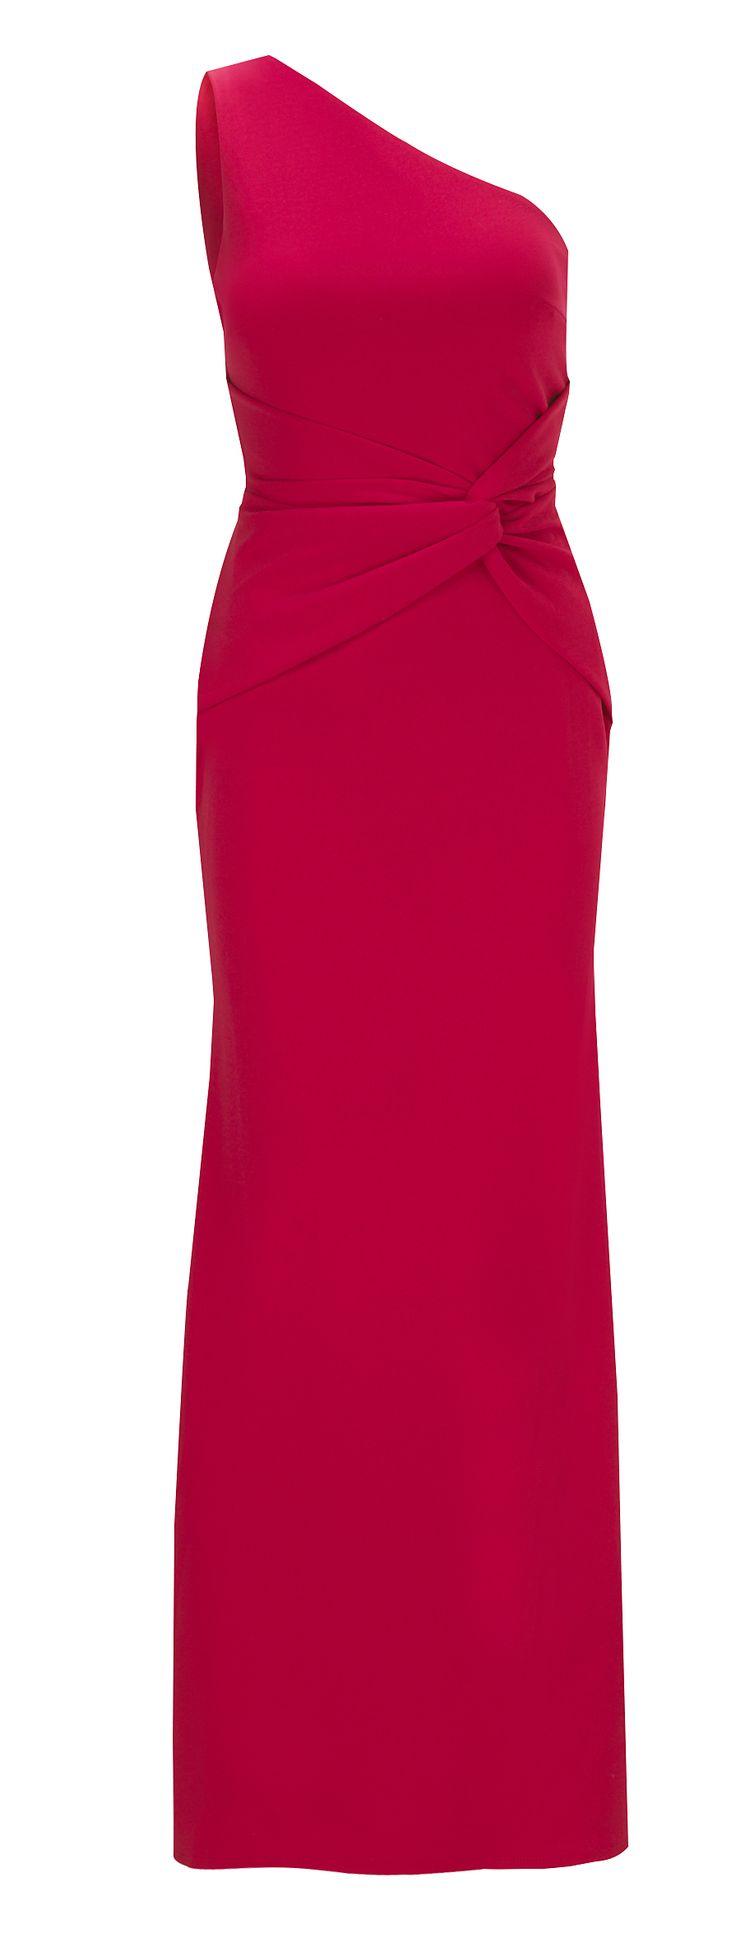 Jessica Wright Nikolina Red One Shoulder Maxi Dress £80.00 http://www.sistaglam.co.uk/jessica-wright-dresses/jessica-wright-nikolina-red-one-shoulder-maxi-dress-1752